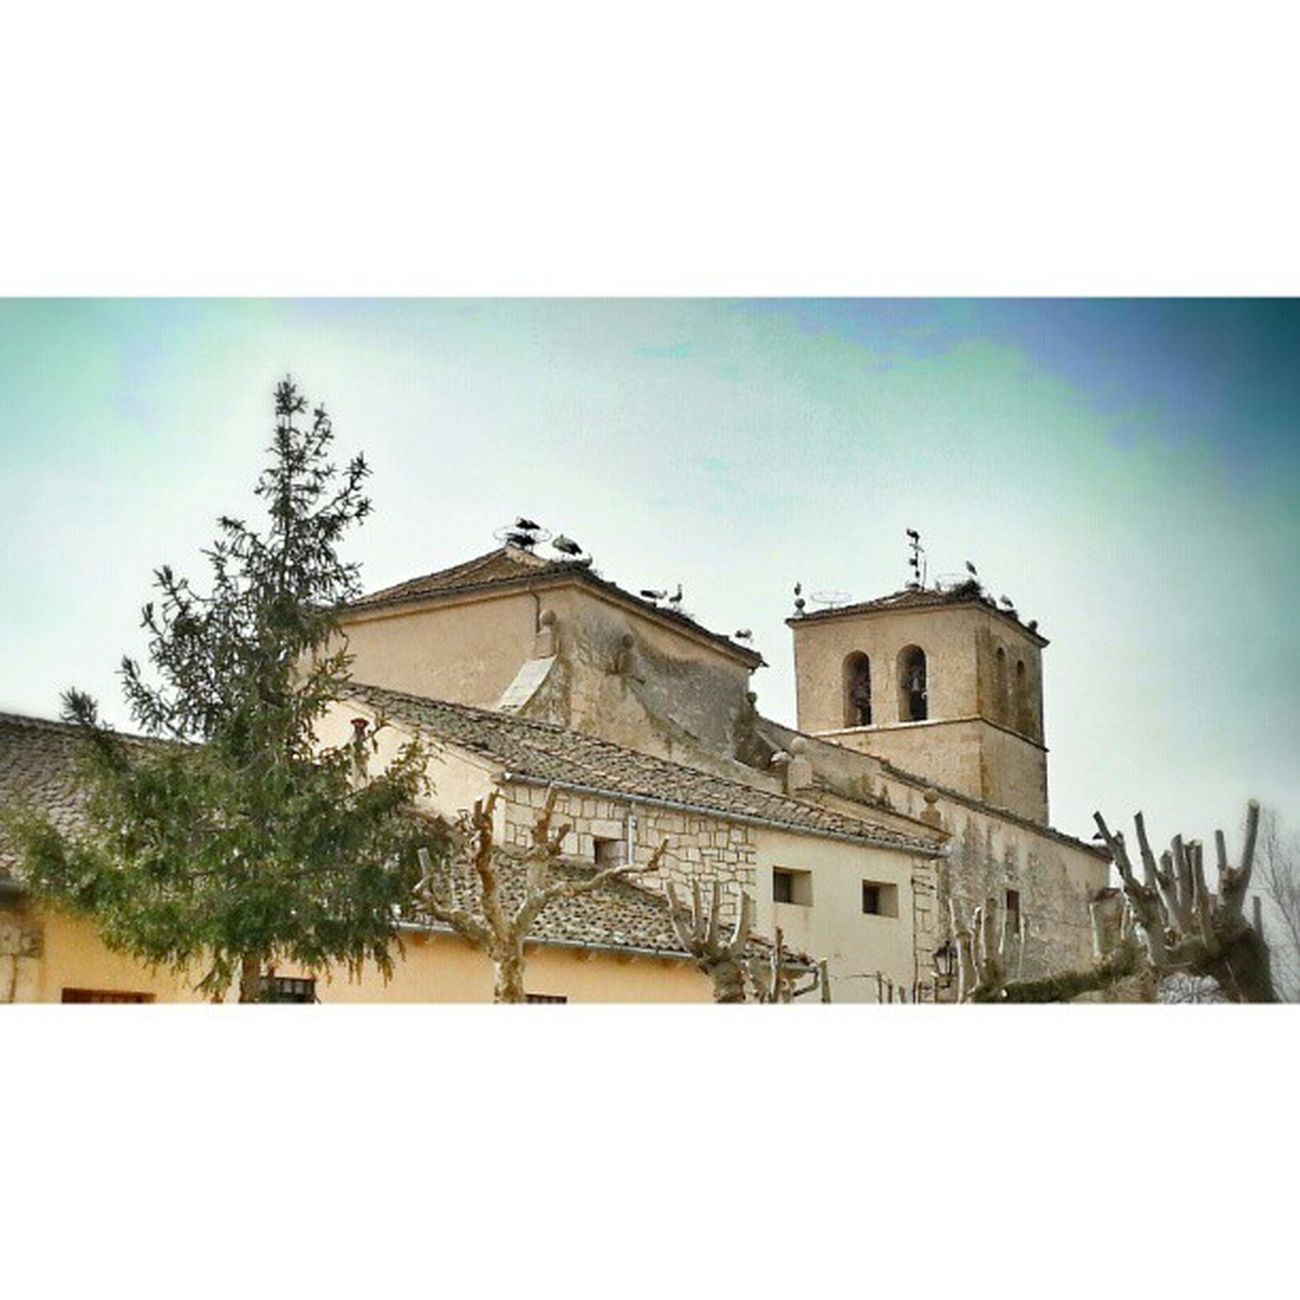 Matabuena Cigüeñas Campanario Segovia Segoviaisdifferent